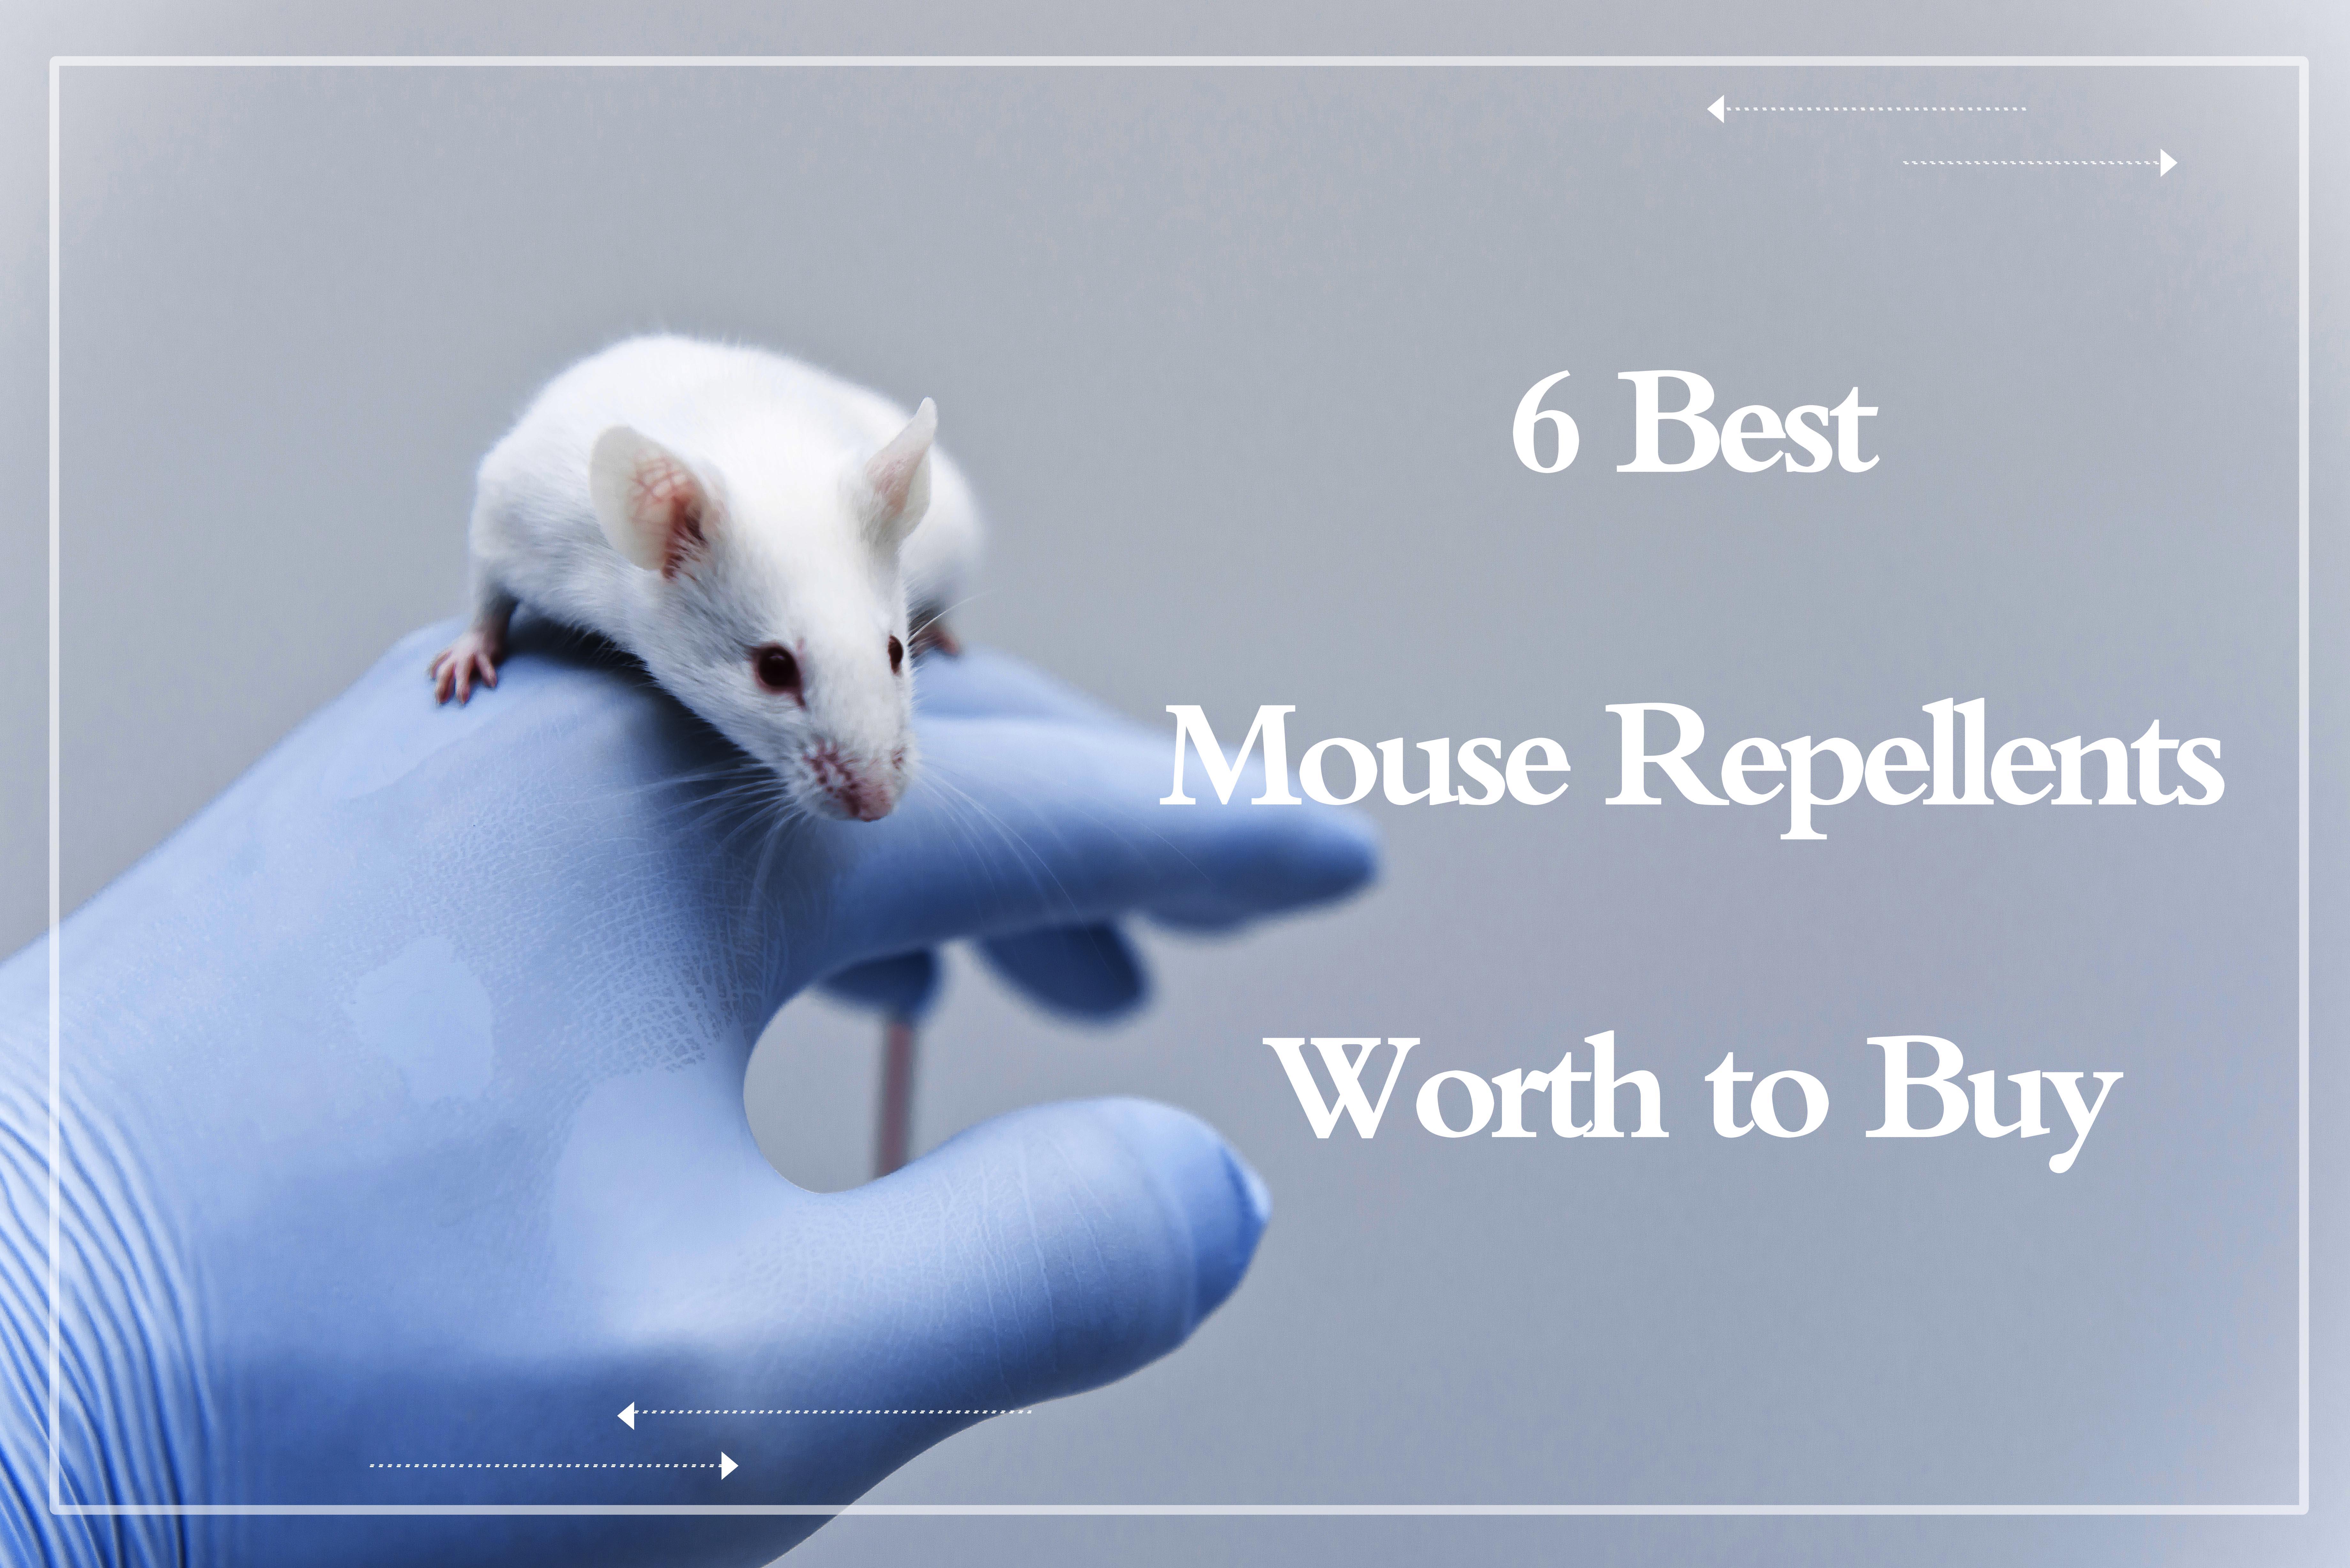 Best Mouse Repellents